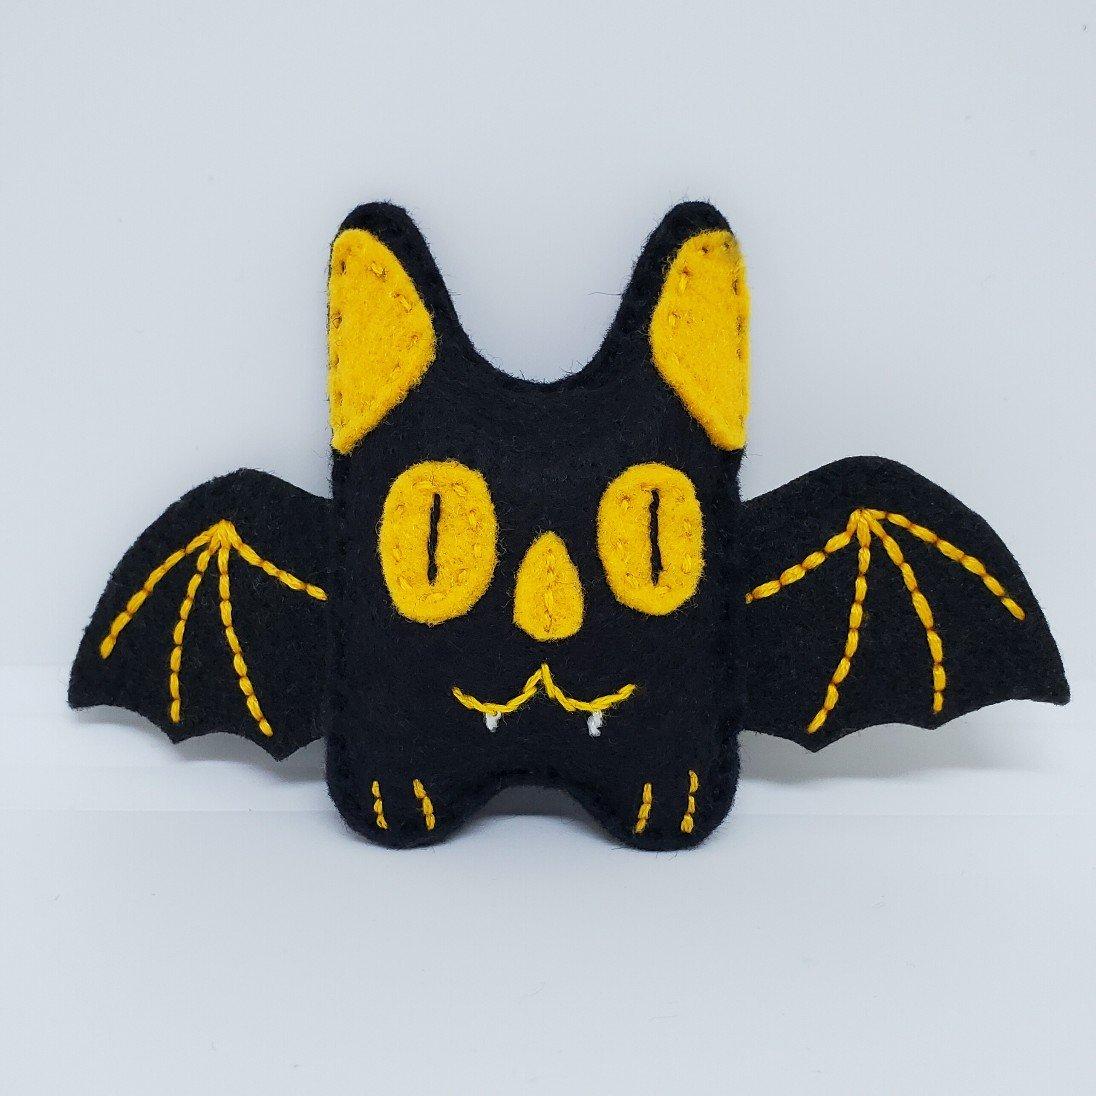 Teeny Black & Yellow Bat